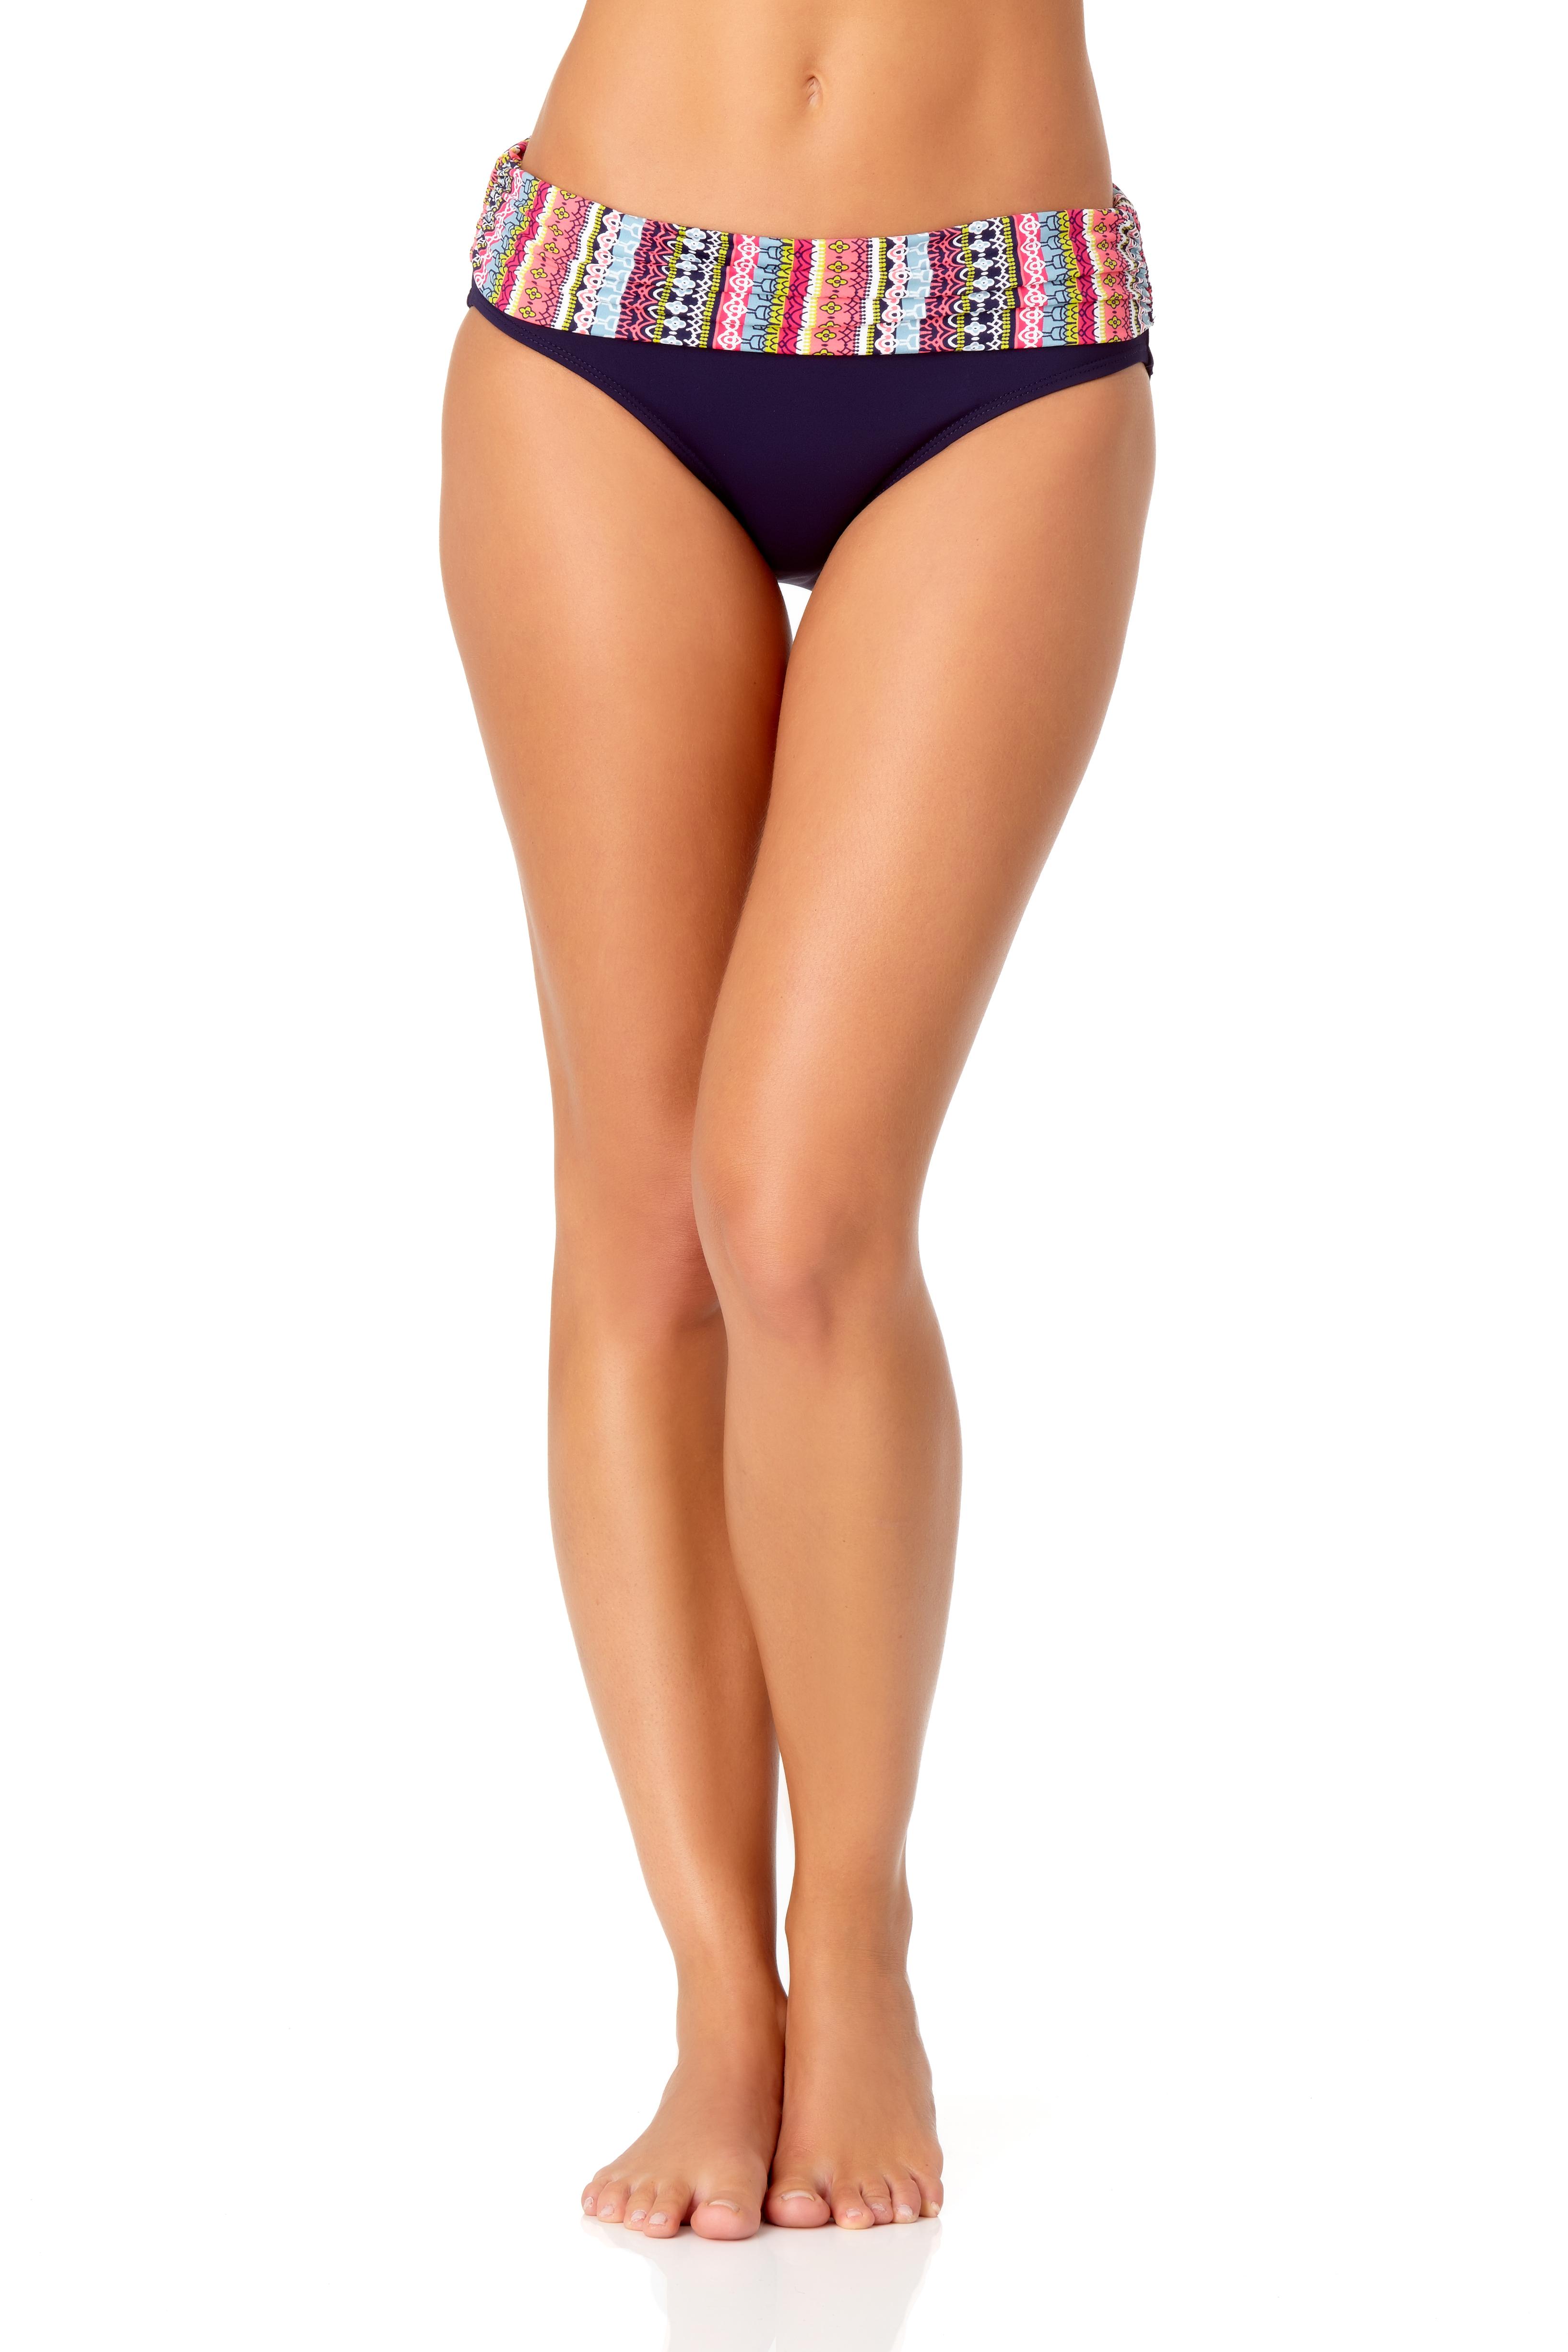 Anne Cole® Jet Set Stripe Foldover Bikini Swimsuit Bottom -Multi - Front